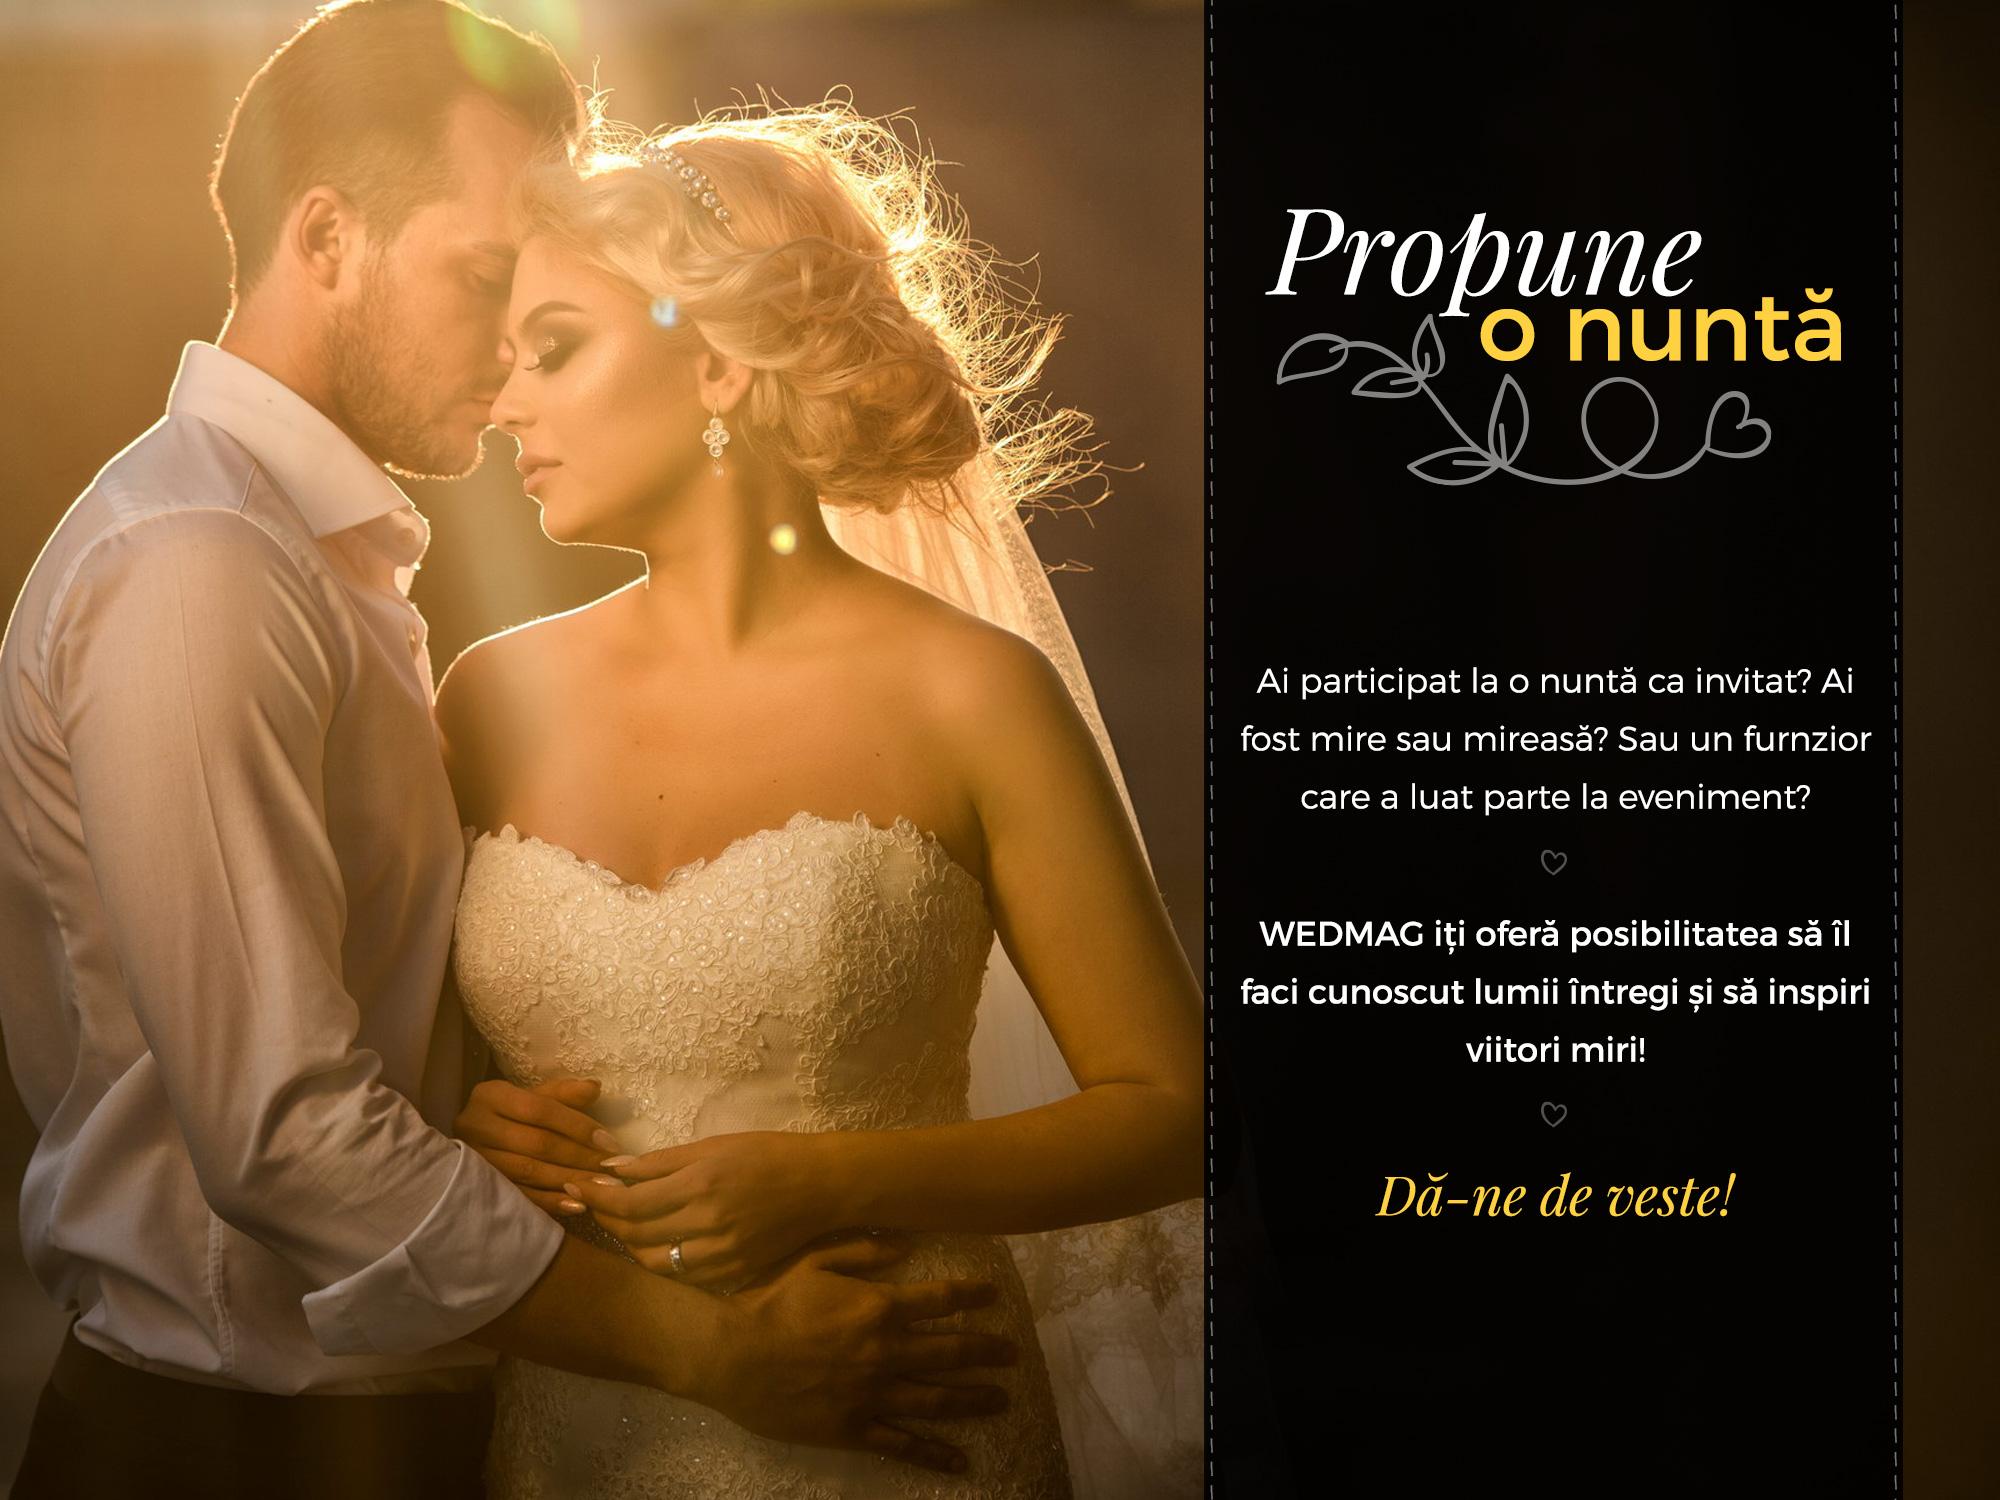 wedmag propune o nunta